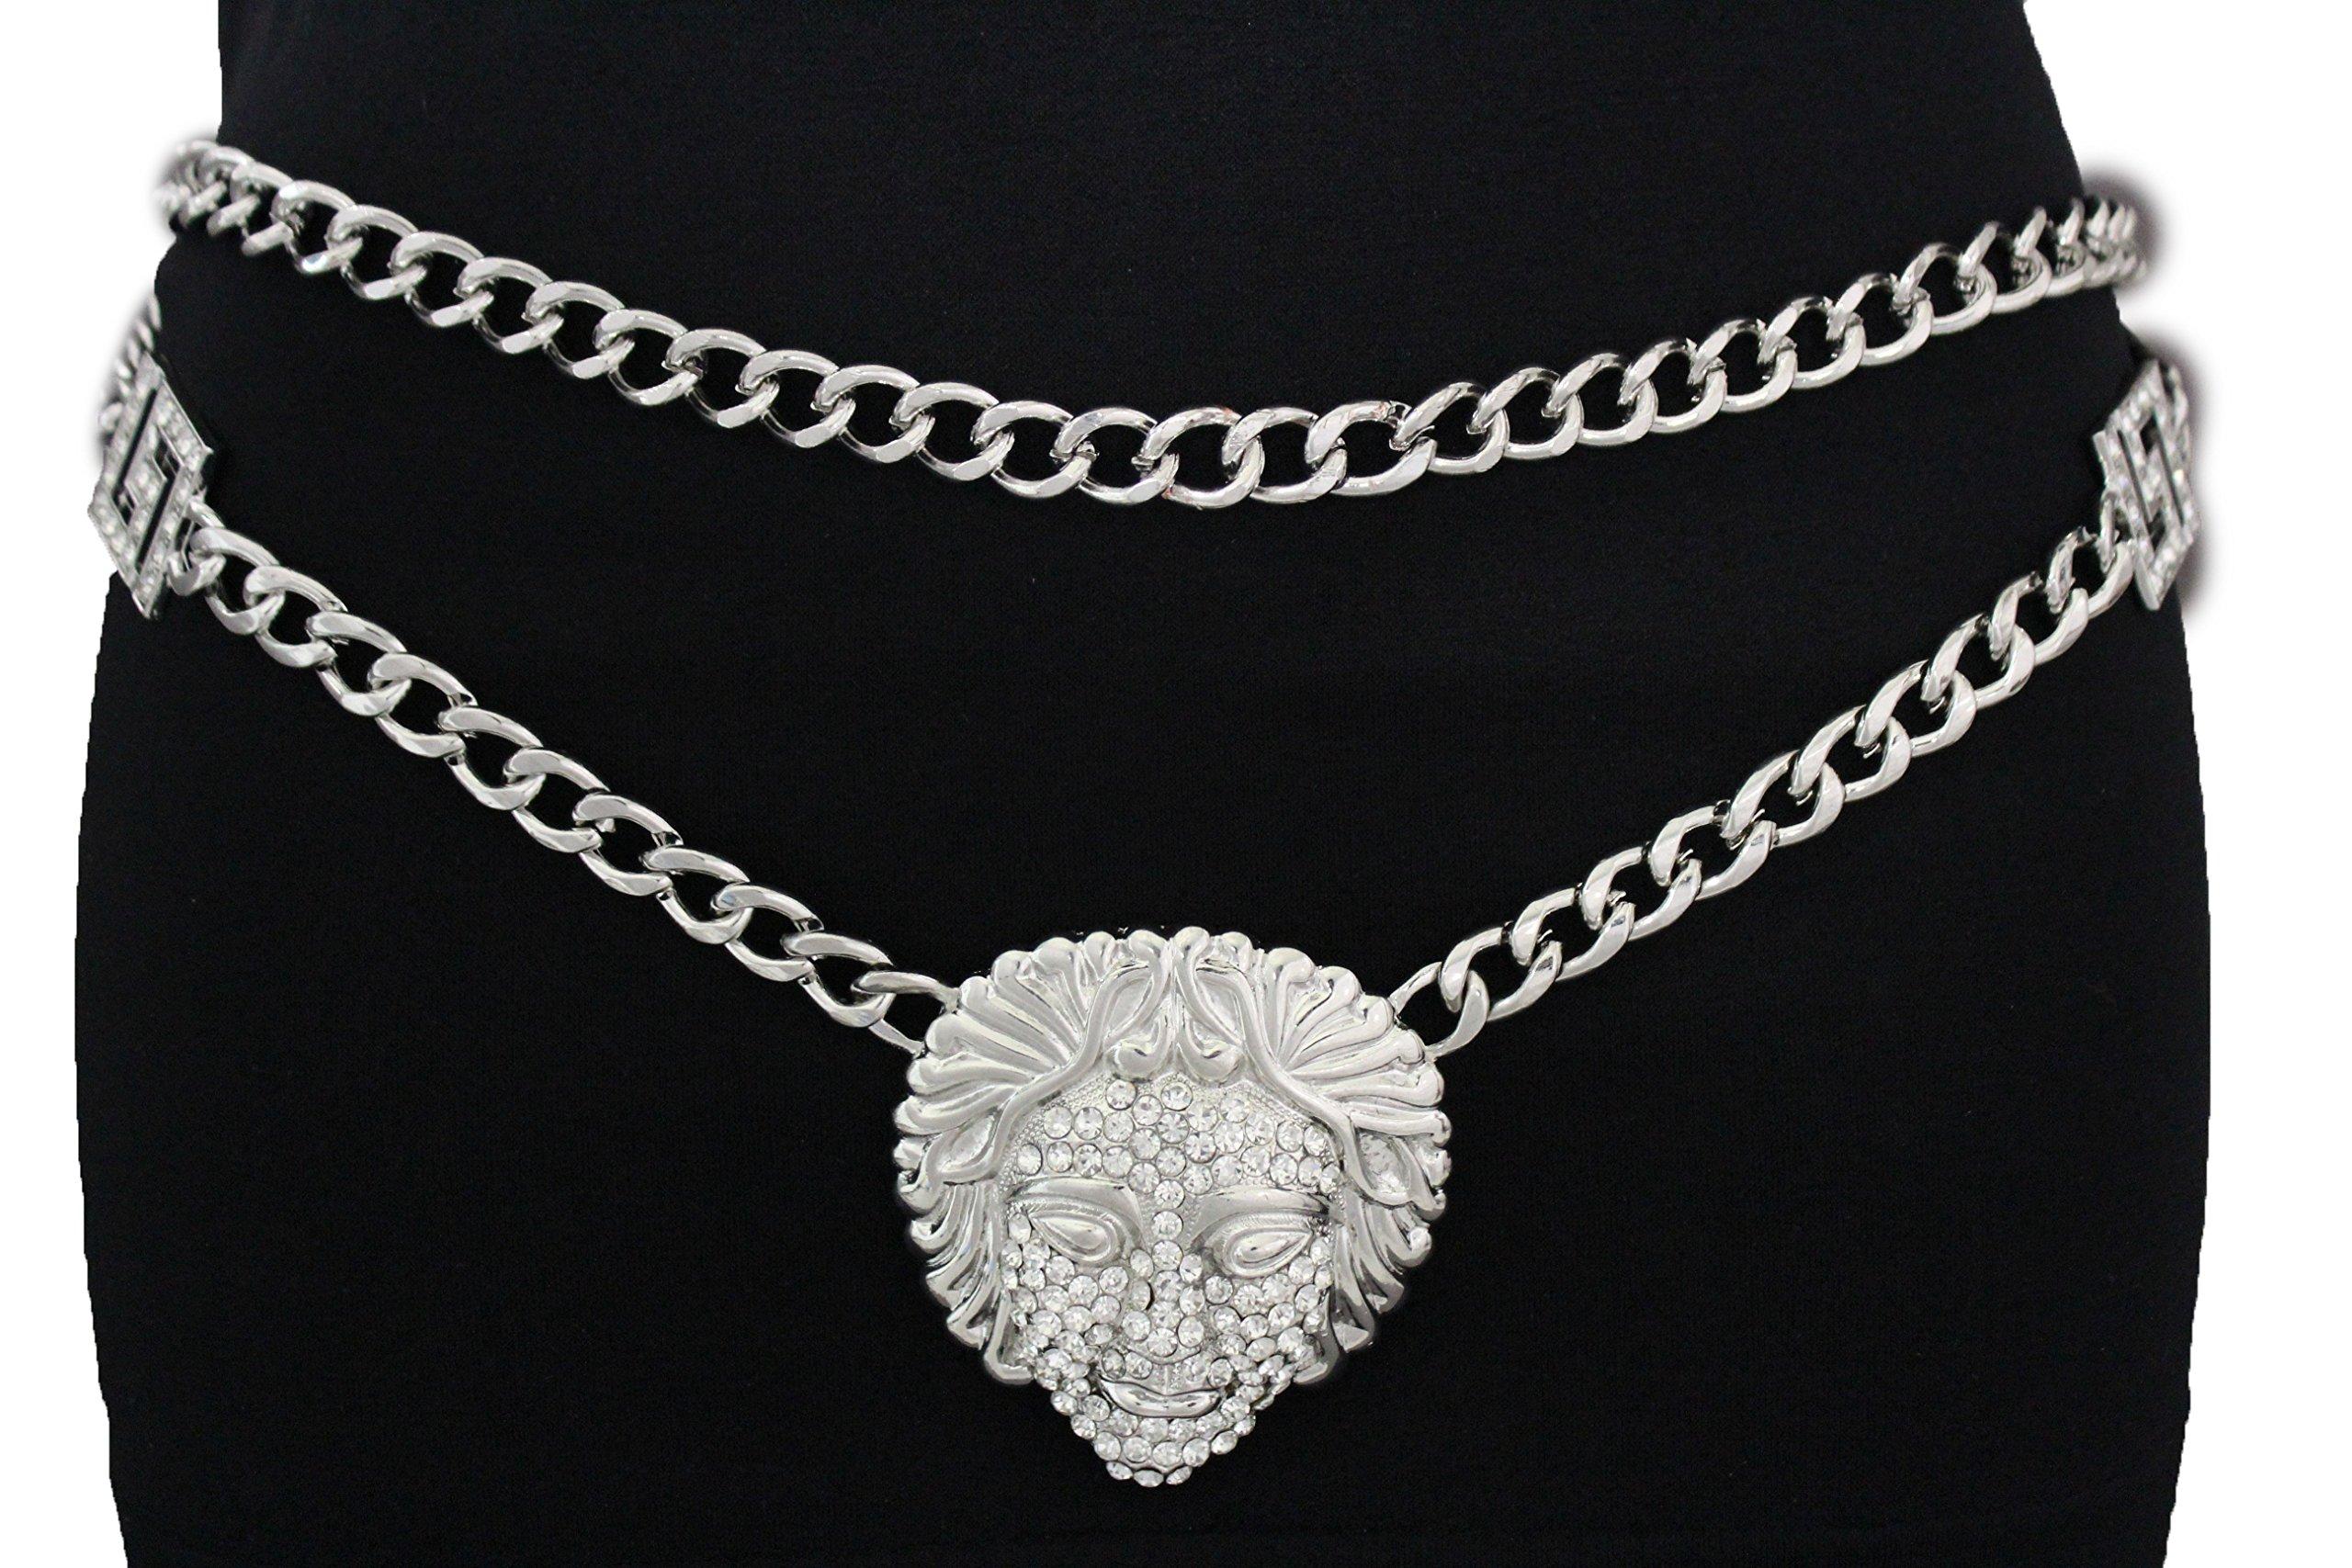 TFJ Women Fashion Metal Belt Hip Waist Chunky Chain Medusa Goddess Charm Plus Silver (L/xl (Waist 35''-45''))